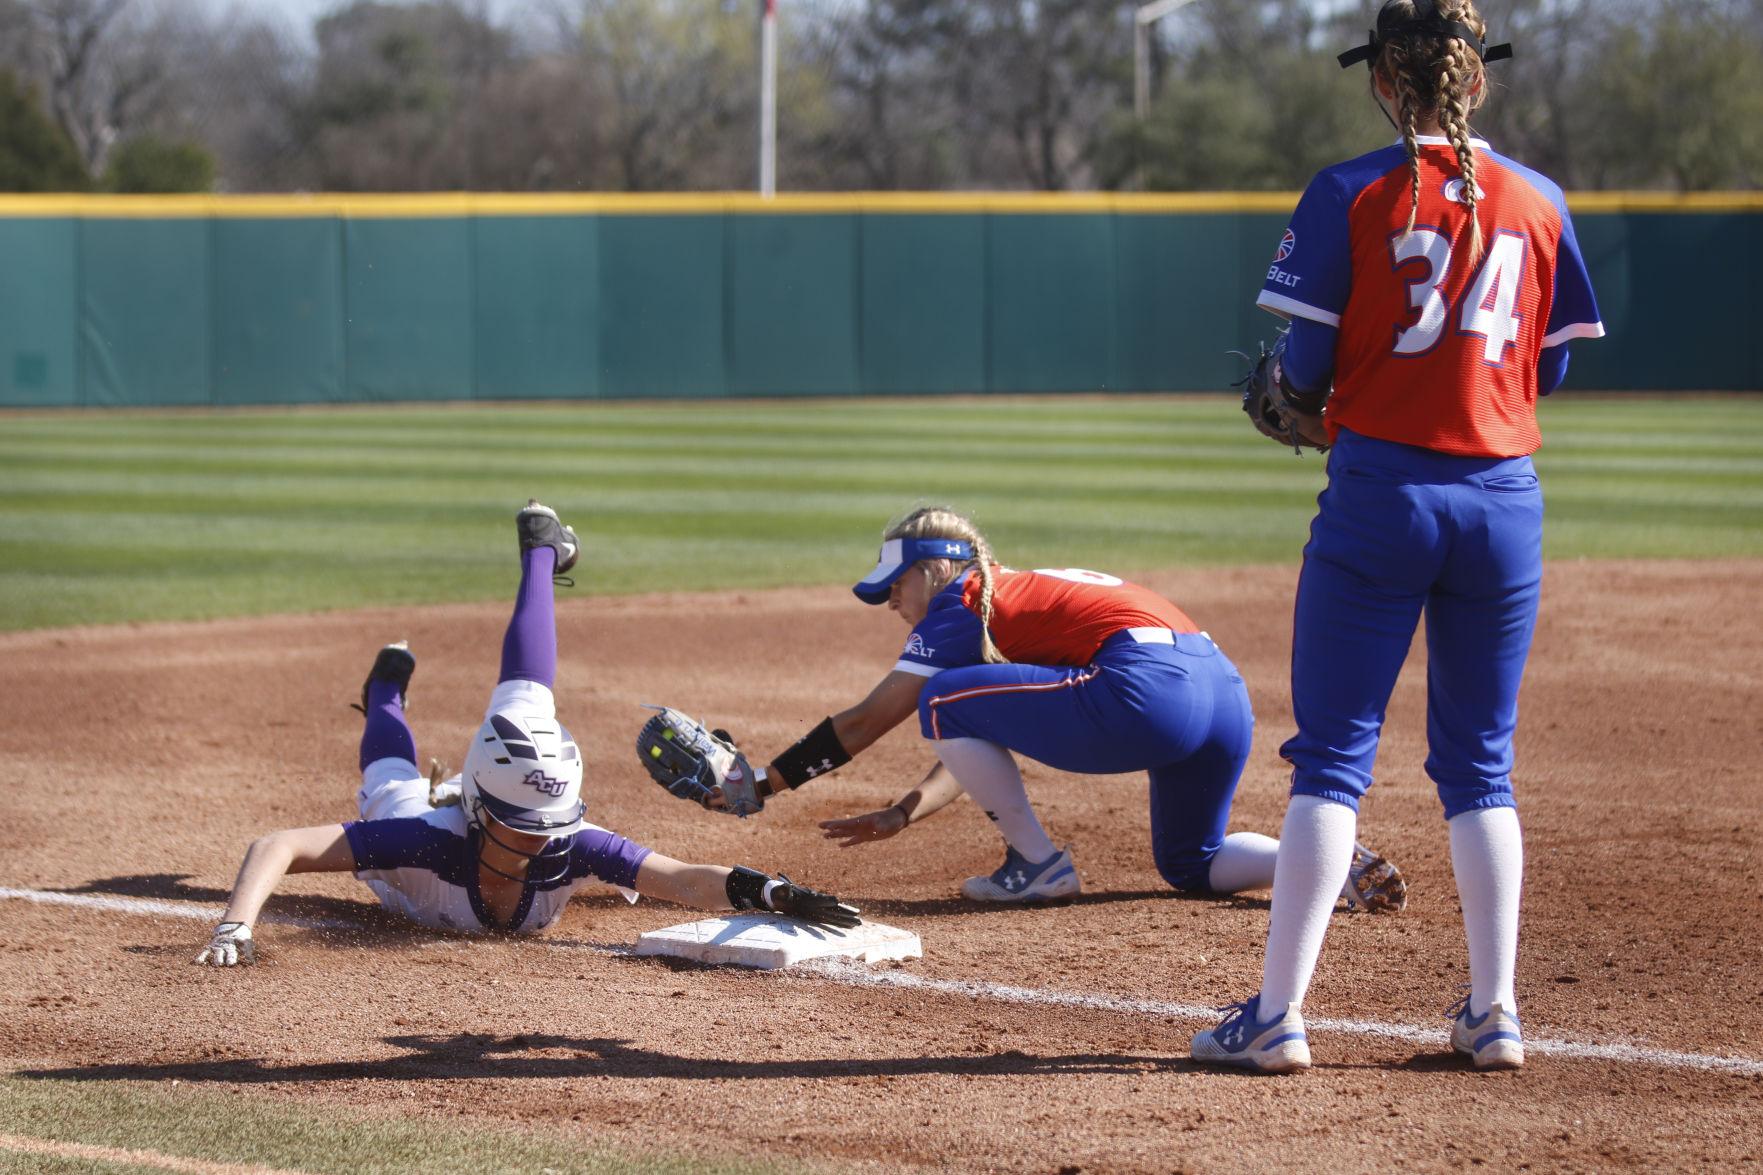 UTA softball caps off Maverick Invitational with win over Abilene Christian University